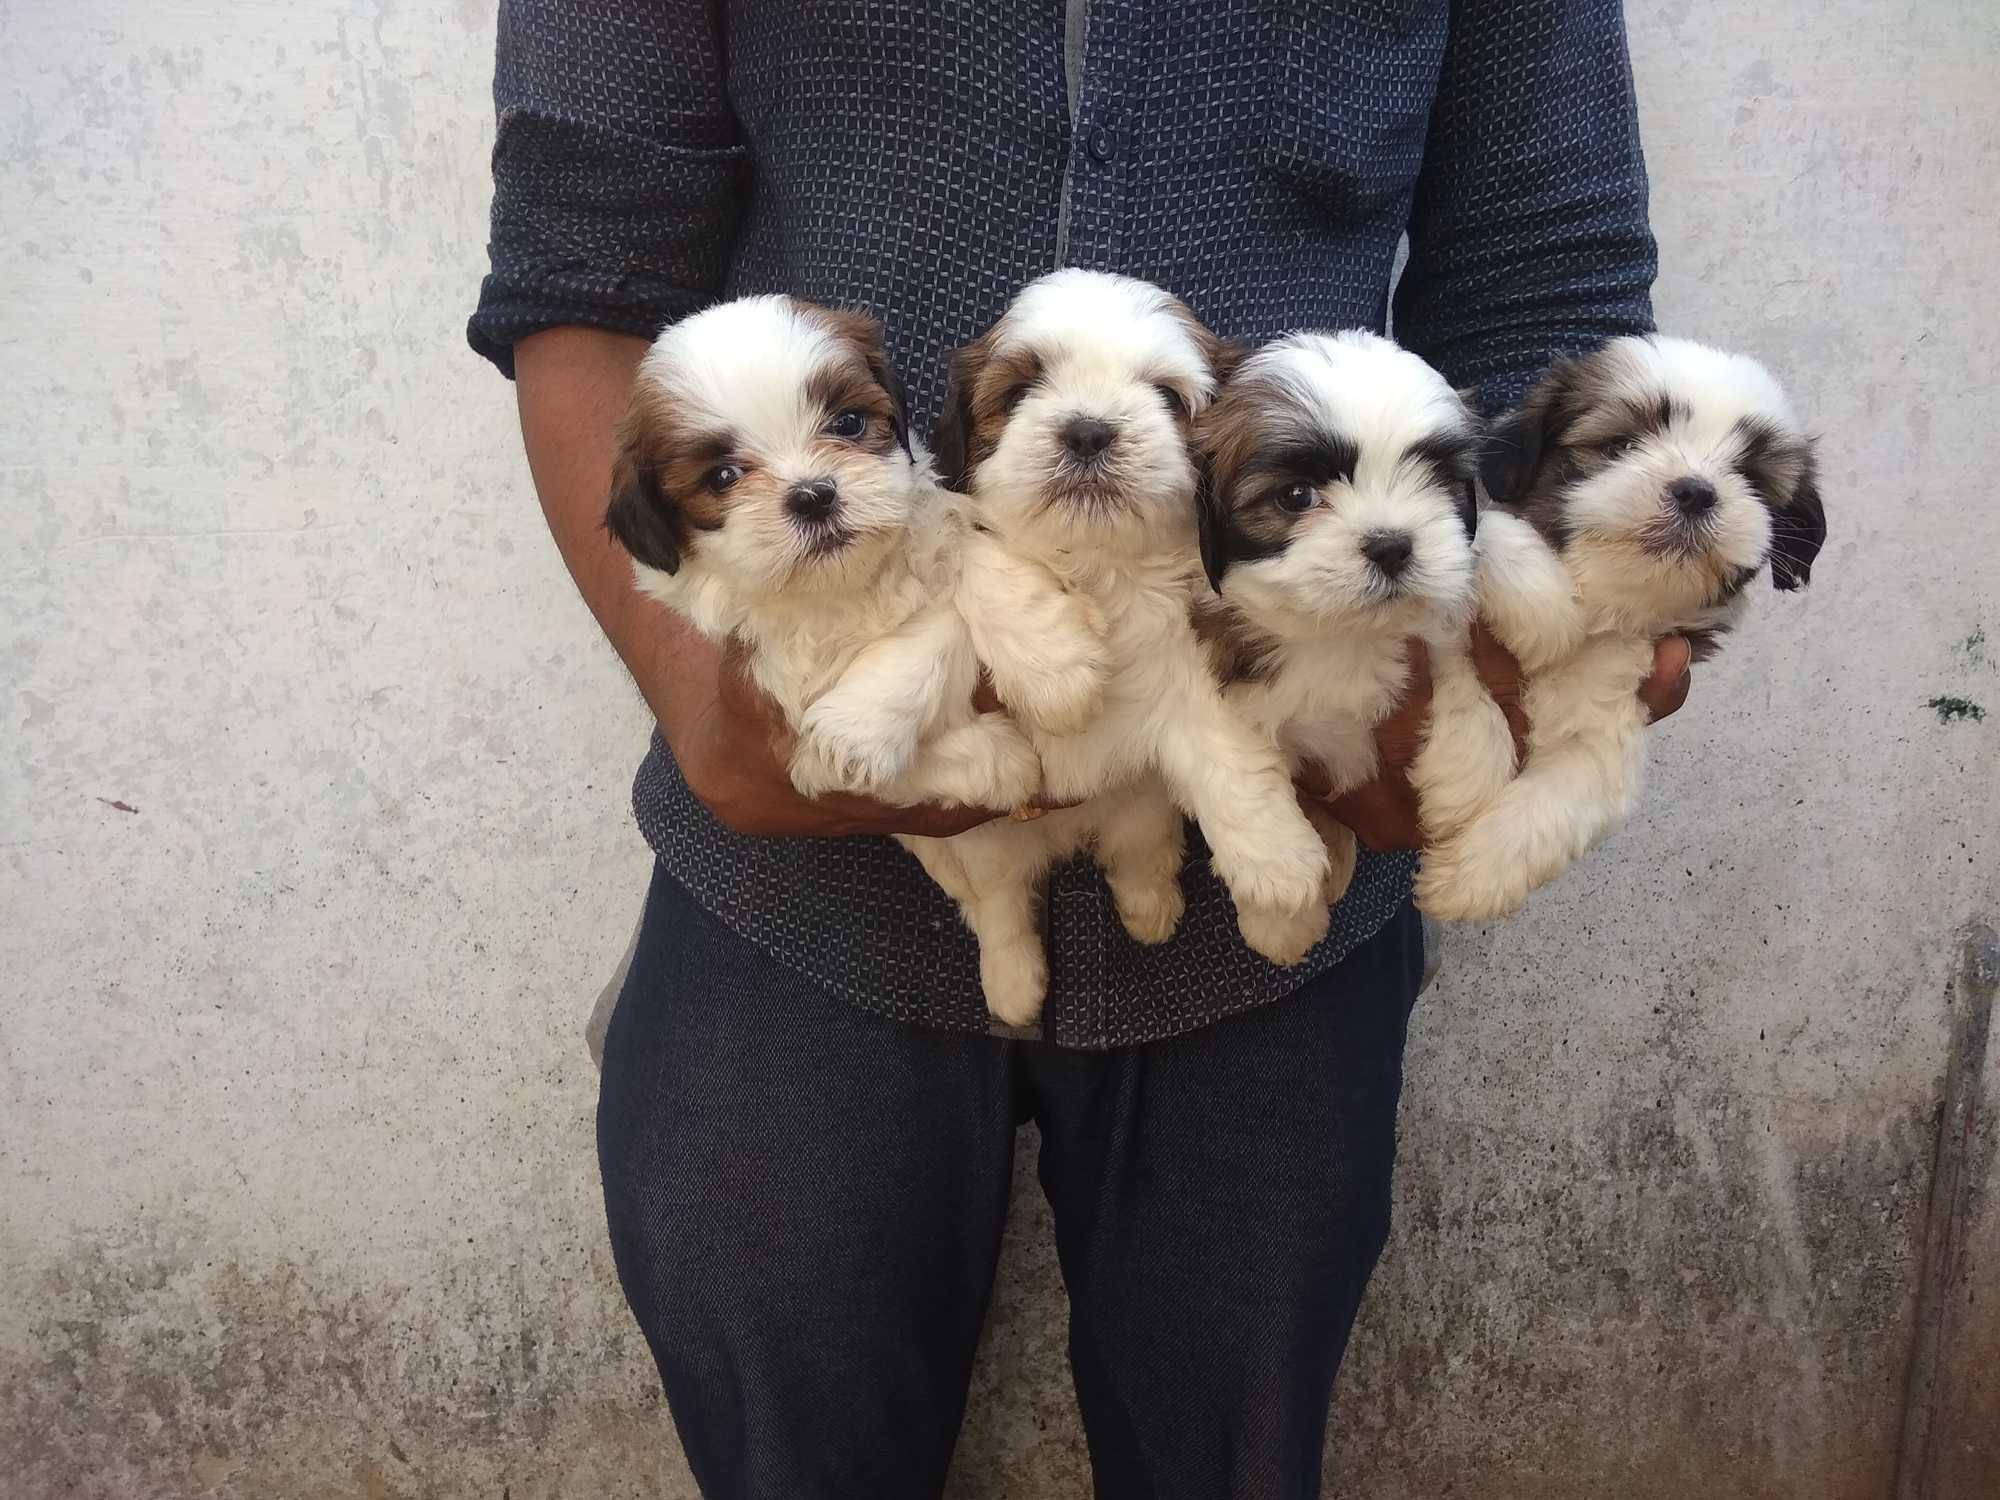 Top Pet Shops For Shih Tzu Dog in Hyderabad - Best Pet